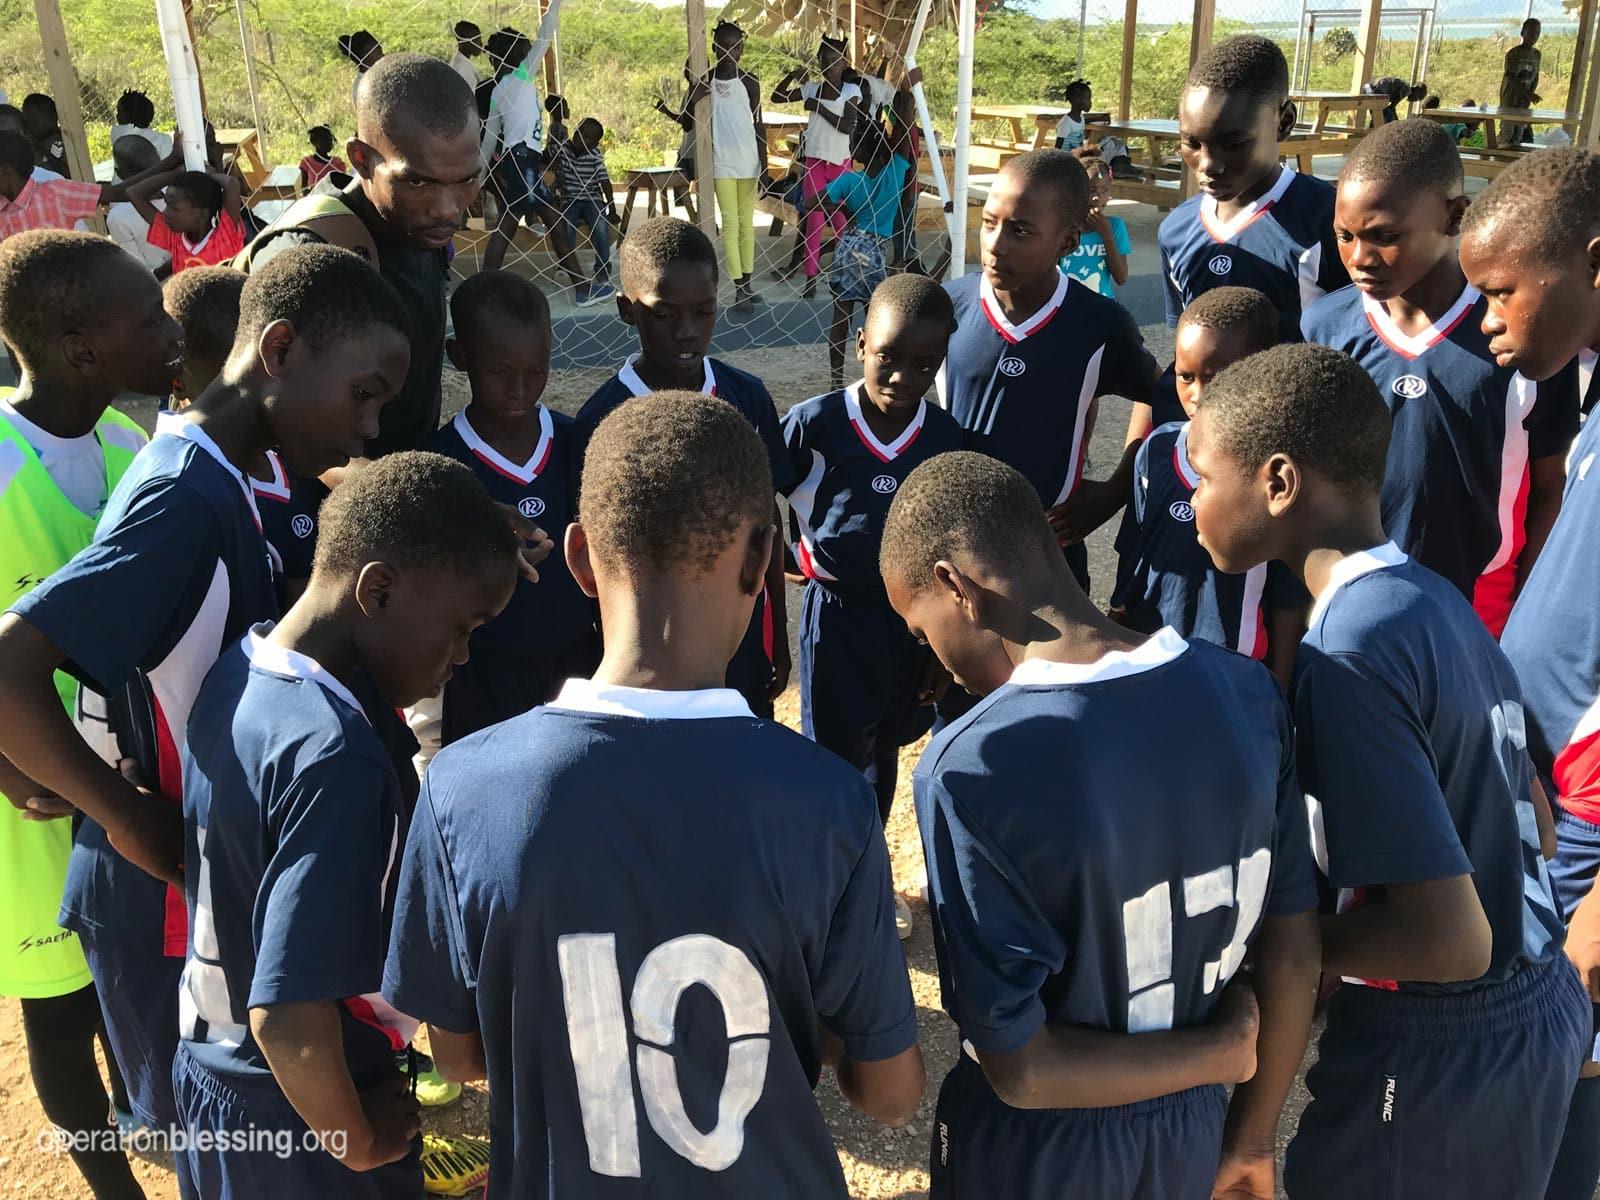 The soccer team from OBI's ENLA school in Haiti.